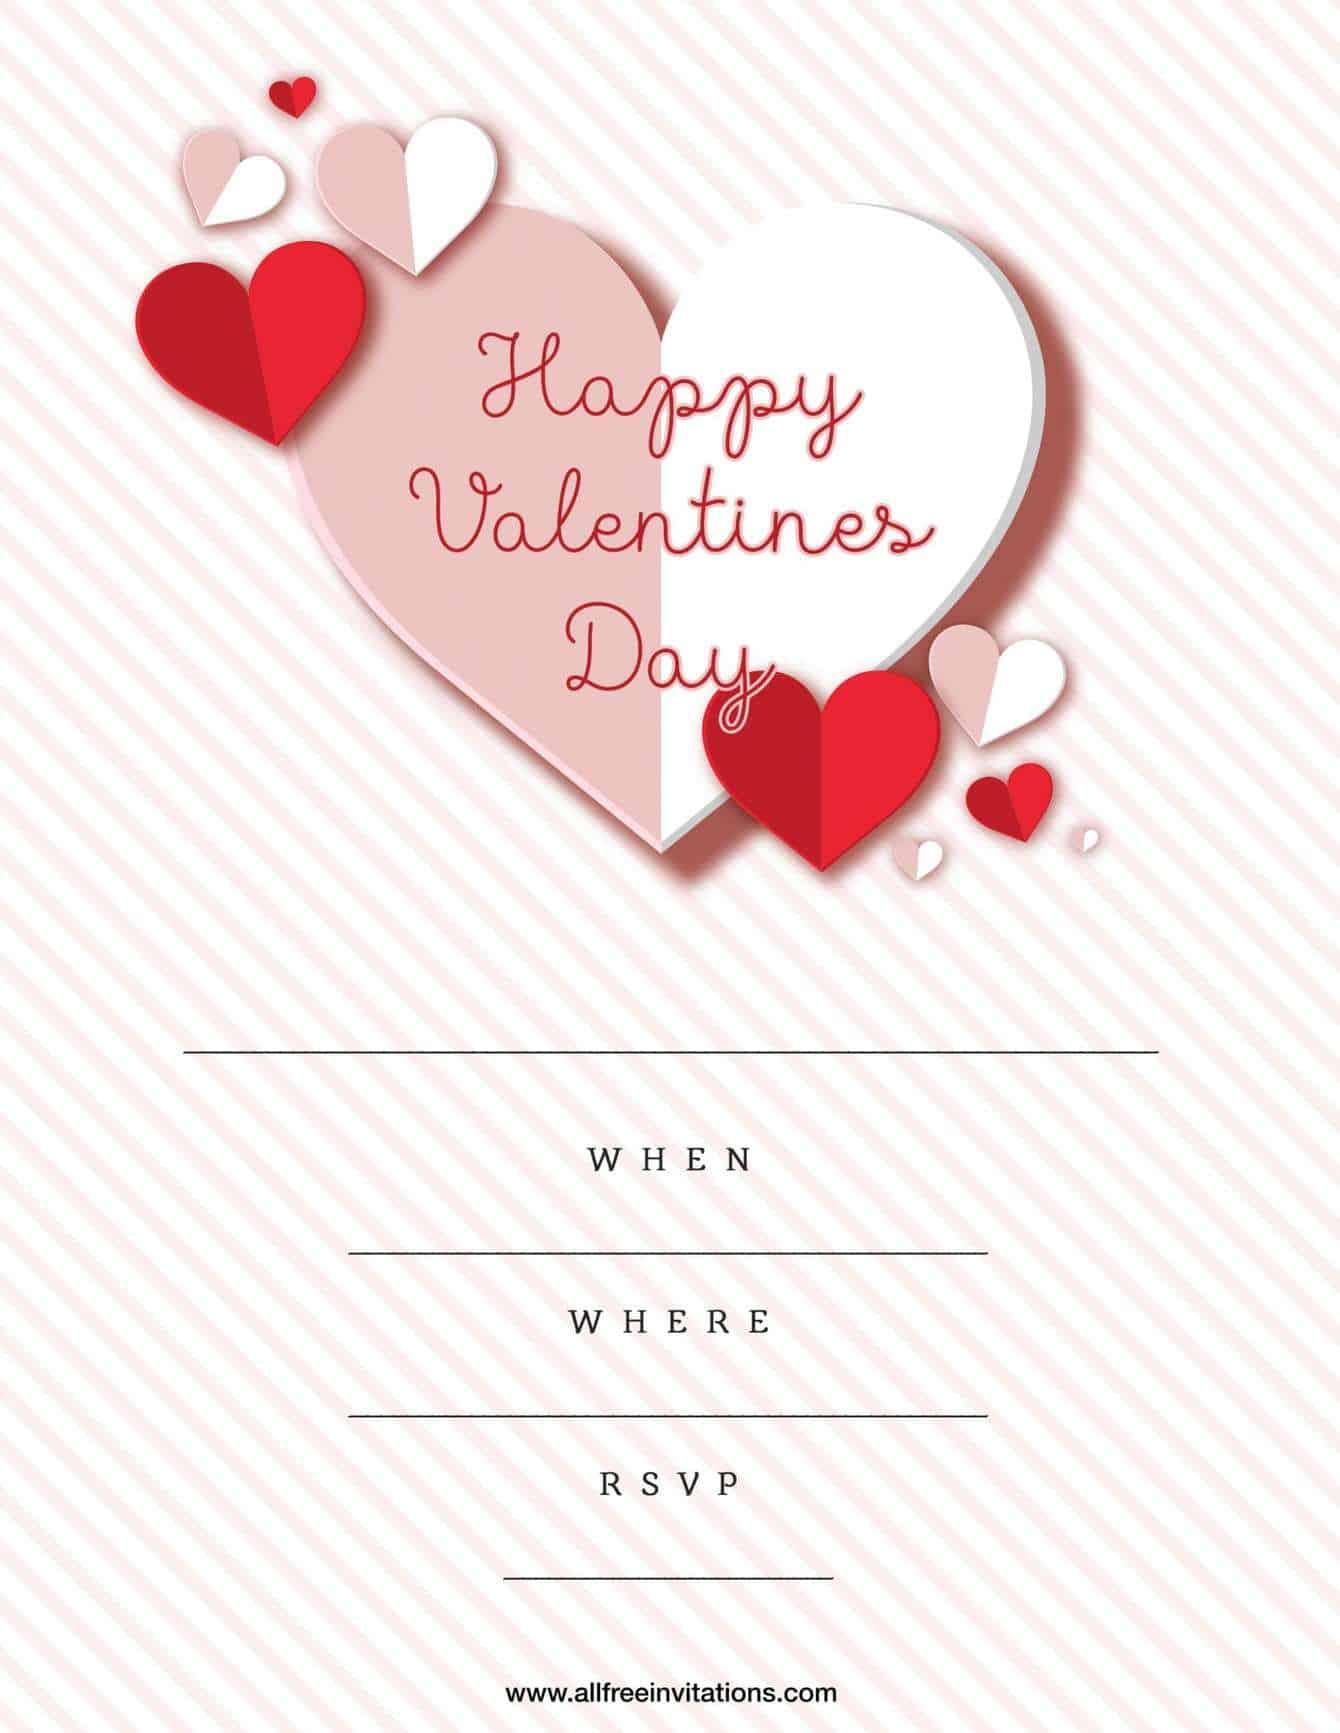 Valentine Party modern stripe design with hearts